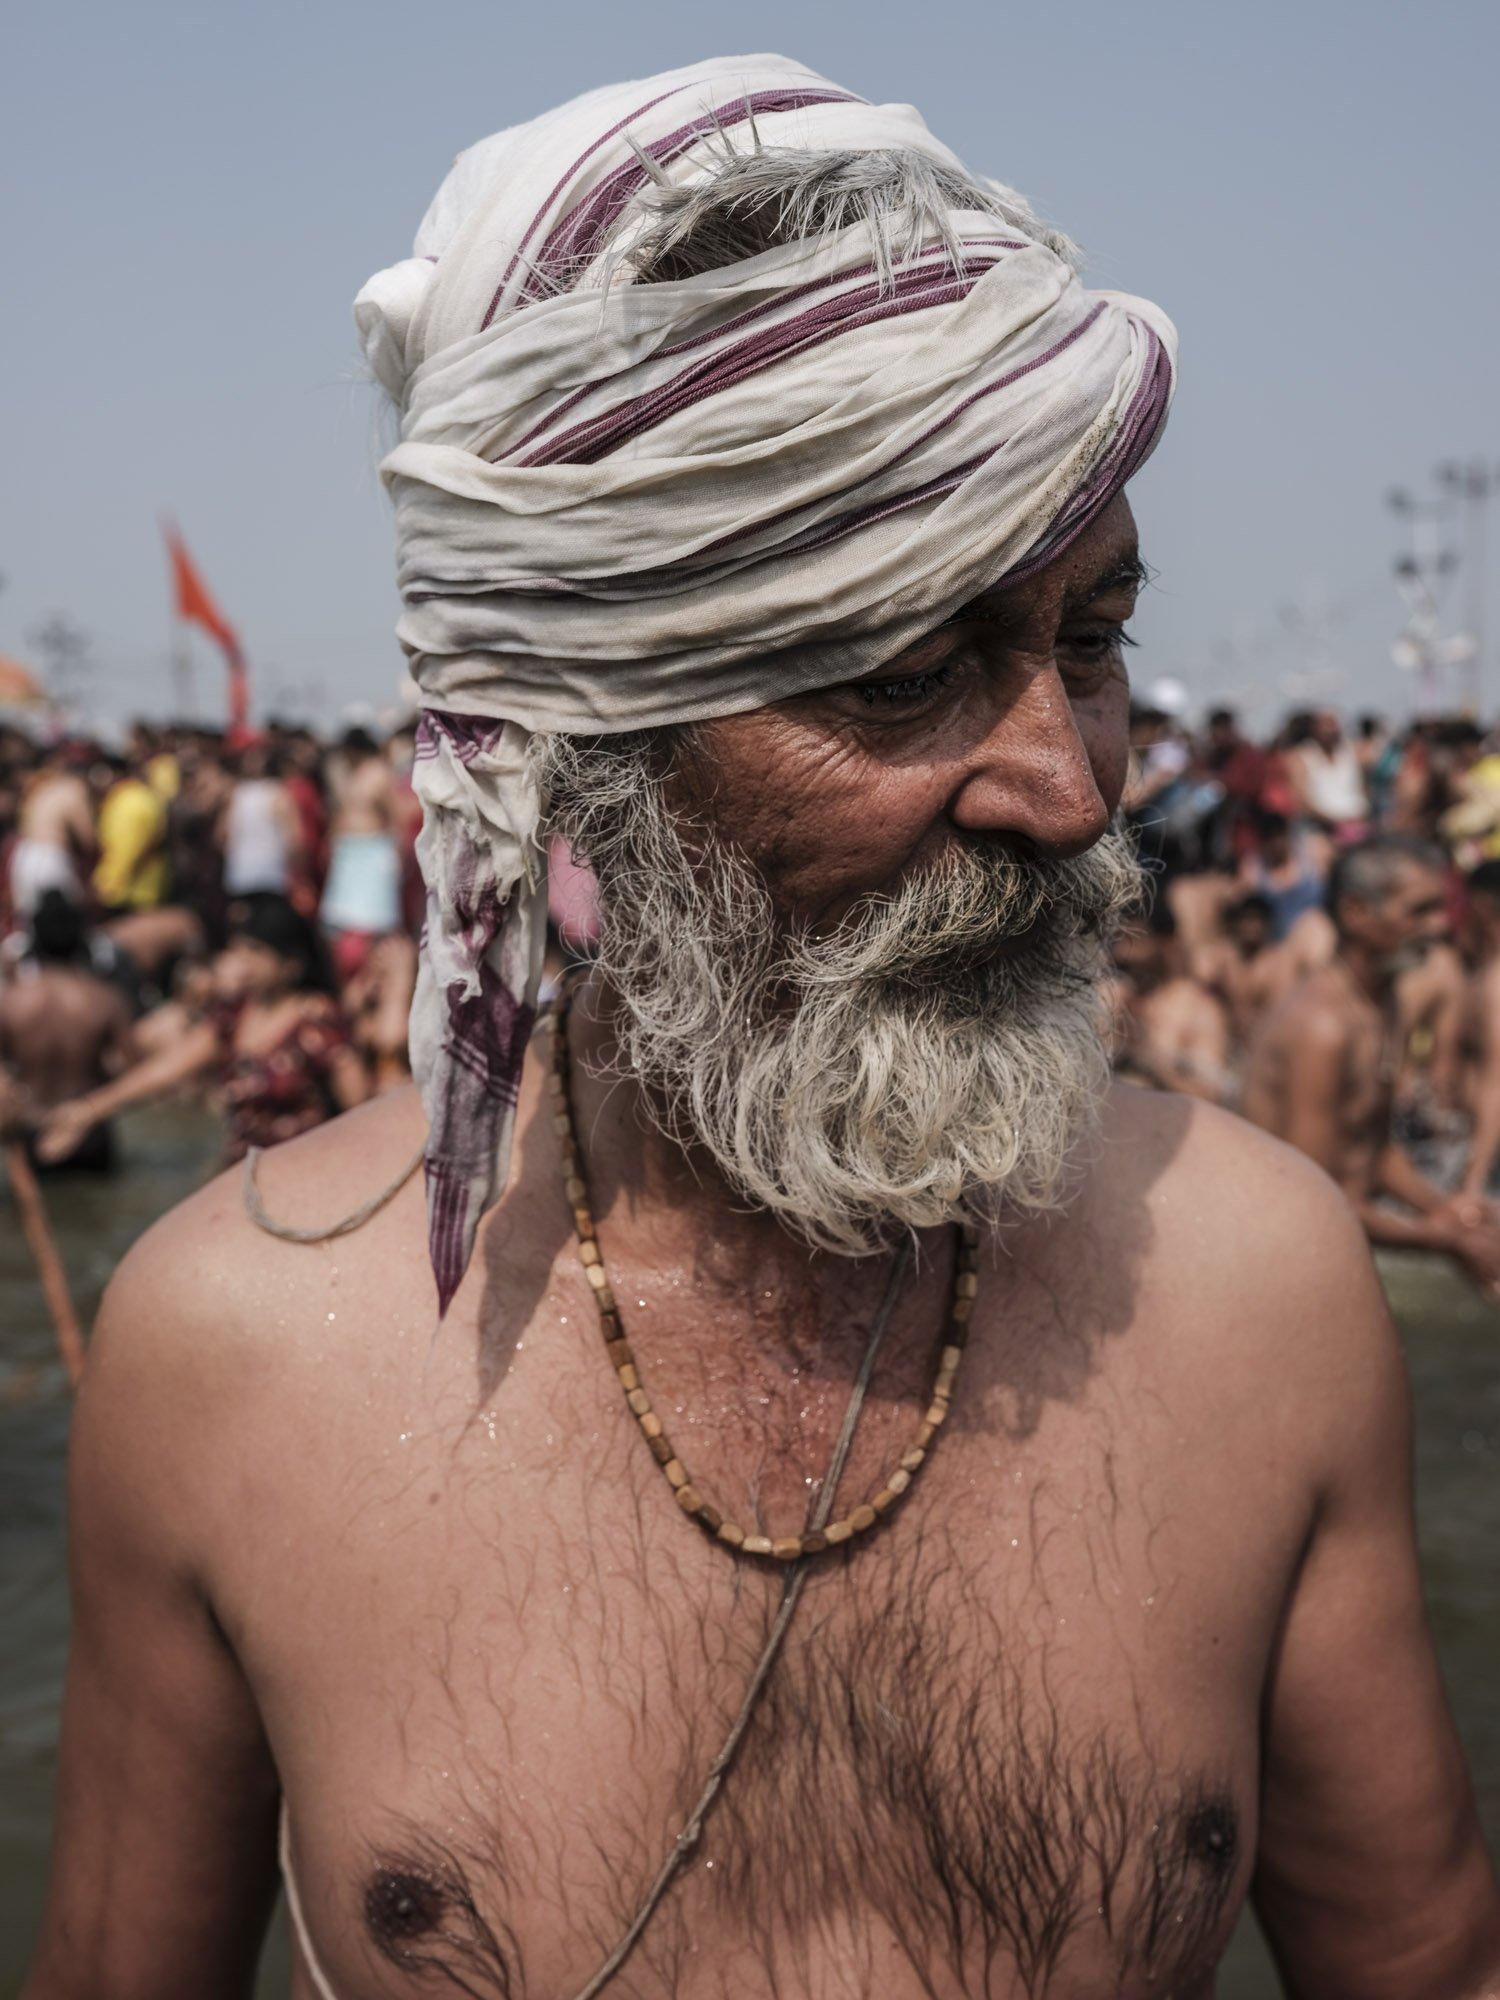 pilgrims Kumbh mela 2019 India Allahabad Prayagraj Ardh hindu religious Festival event rivers photographer jose jeuland photography man people